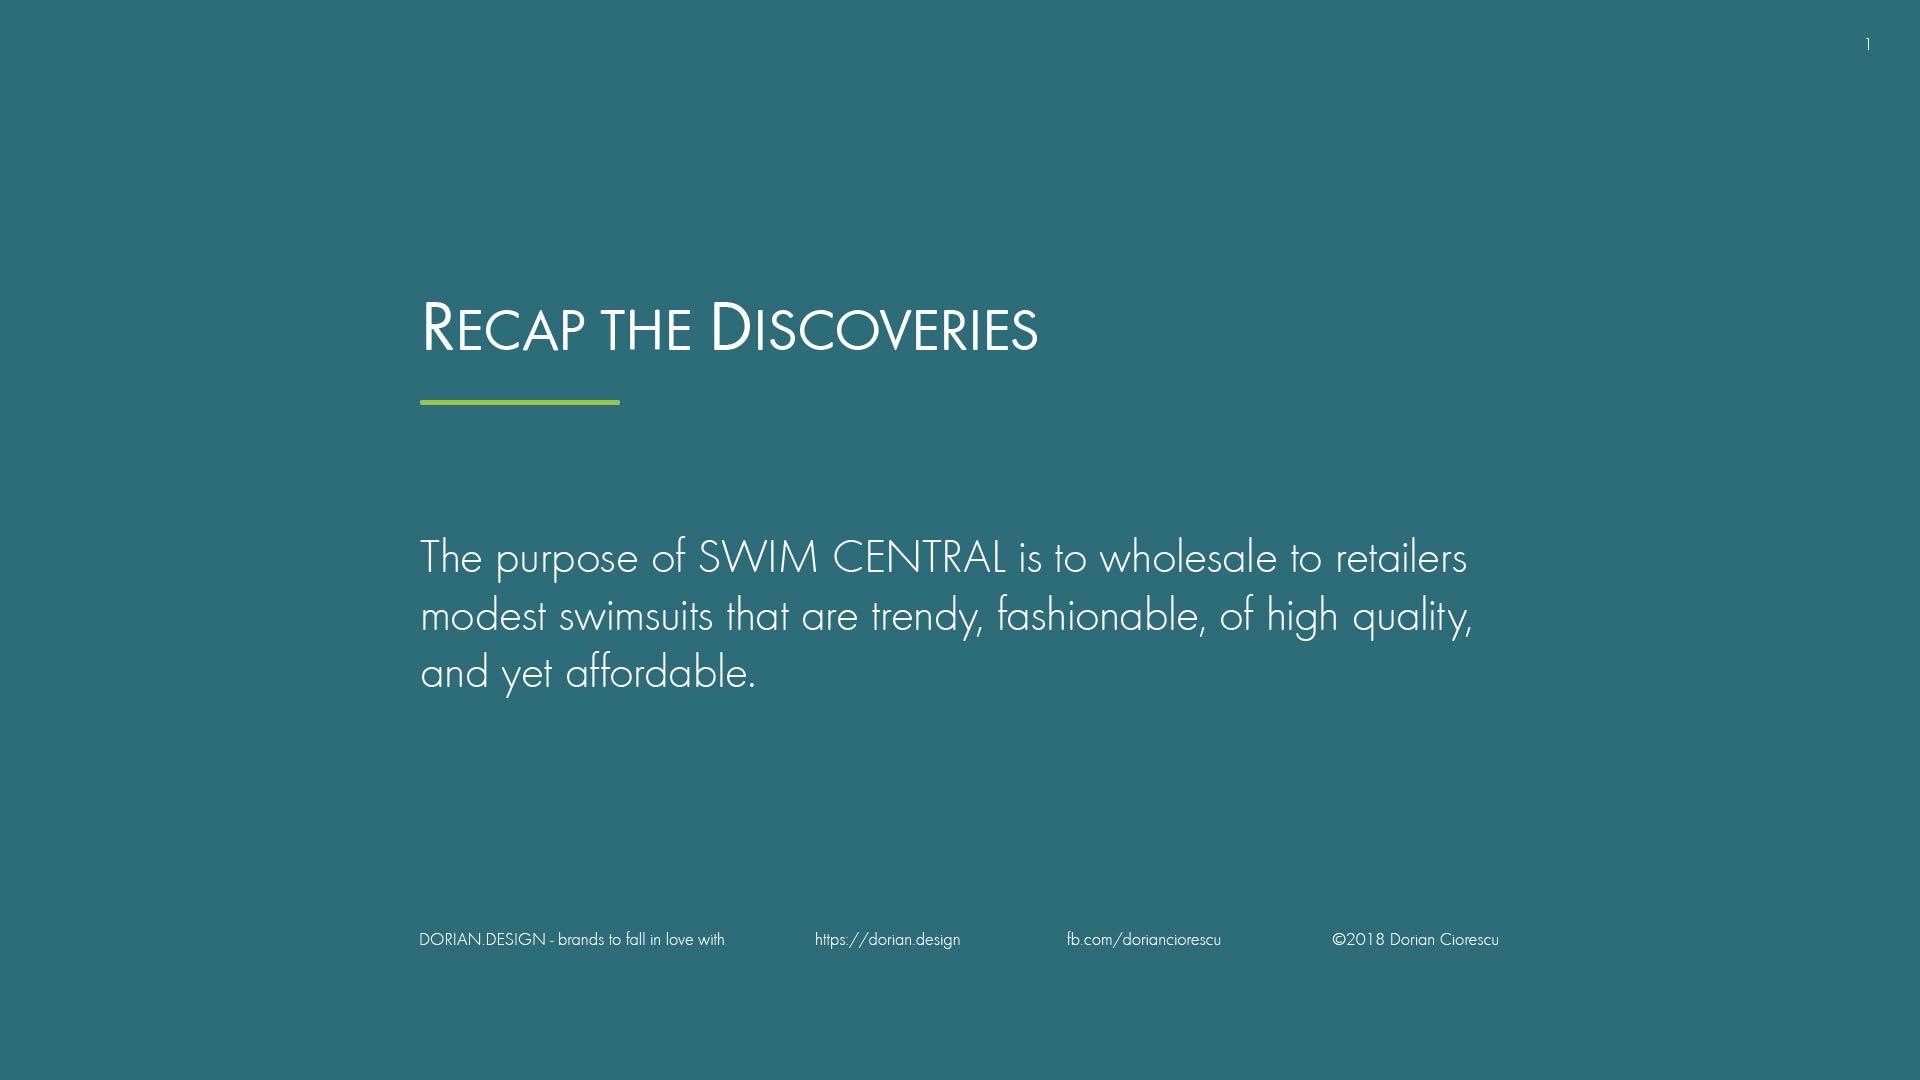 swim-central-logo-presentationArtboard 1-50